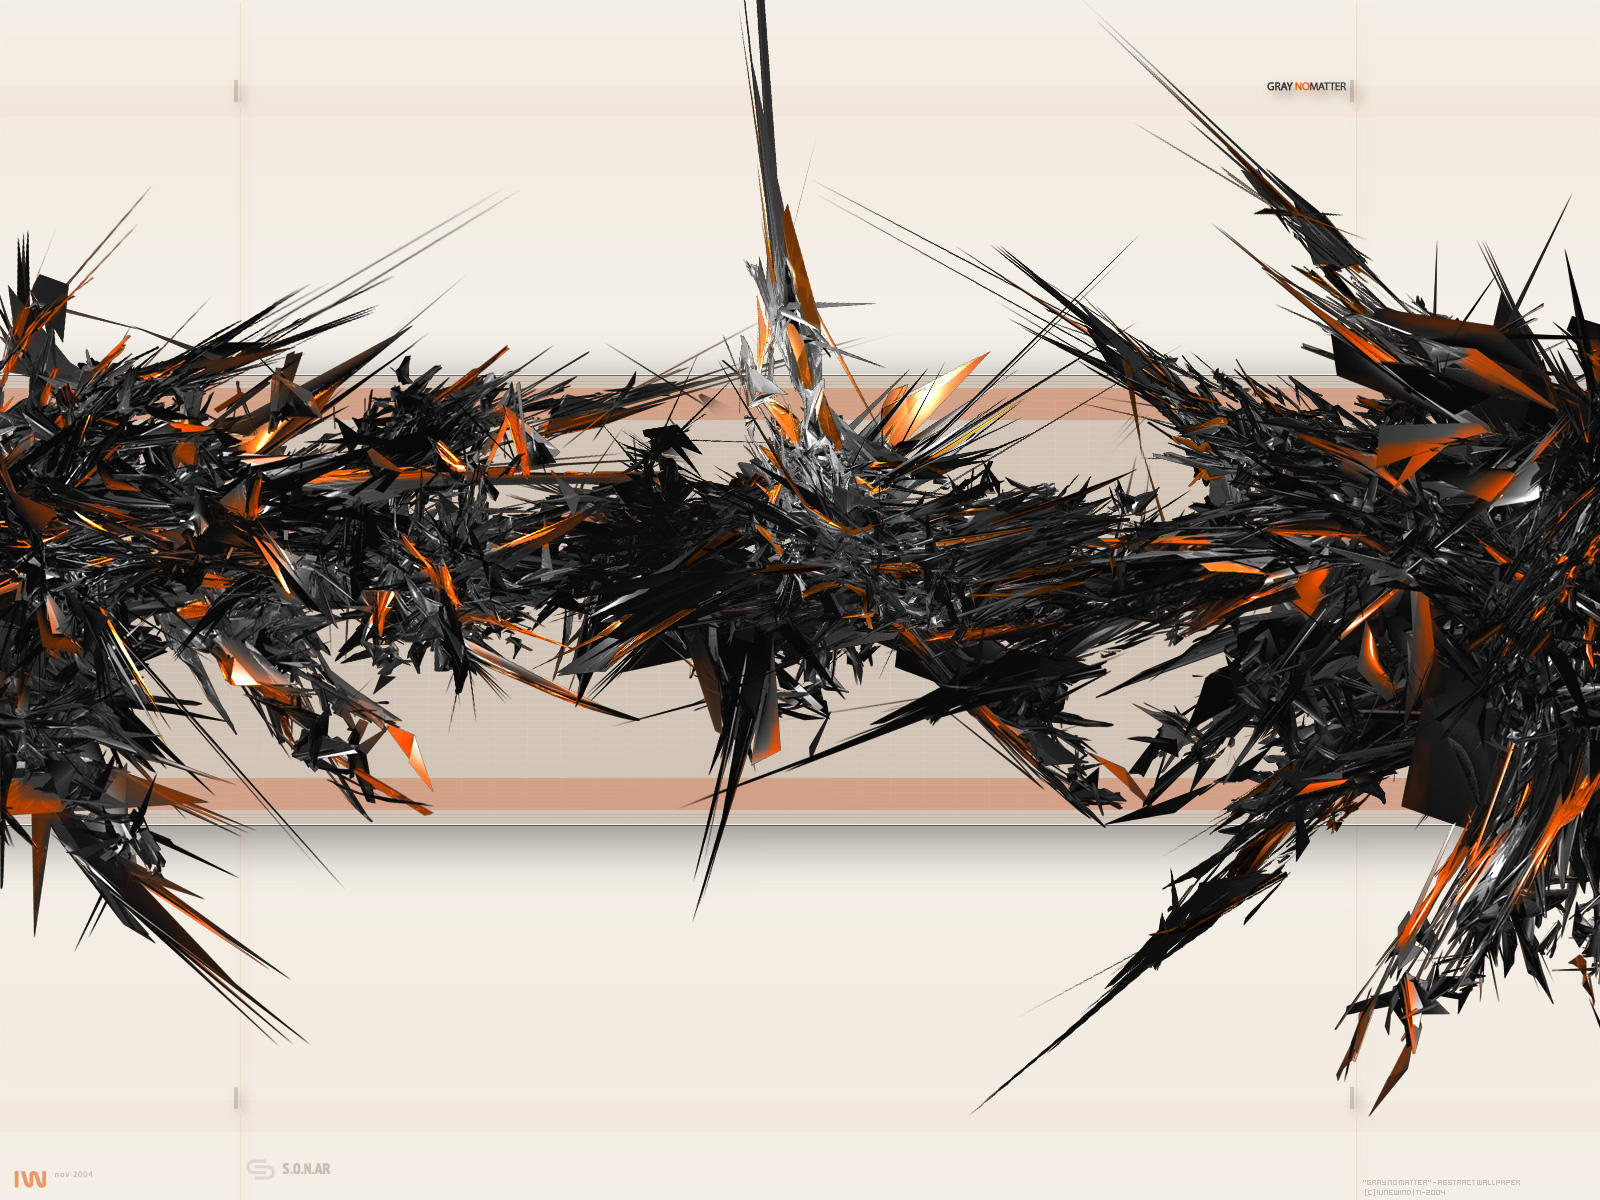 gray_nomatter by iuneWind